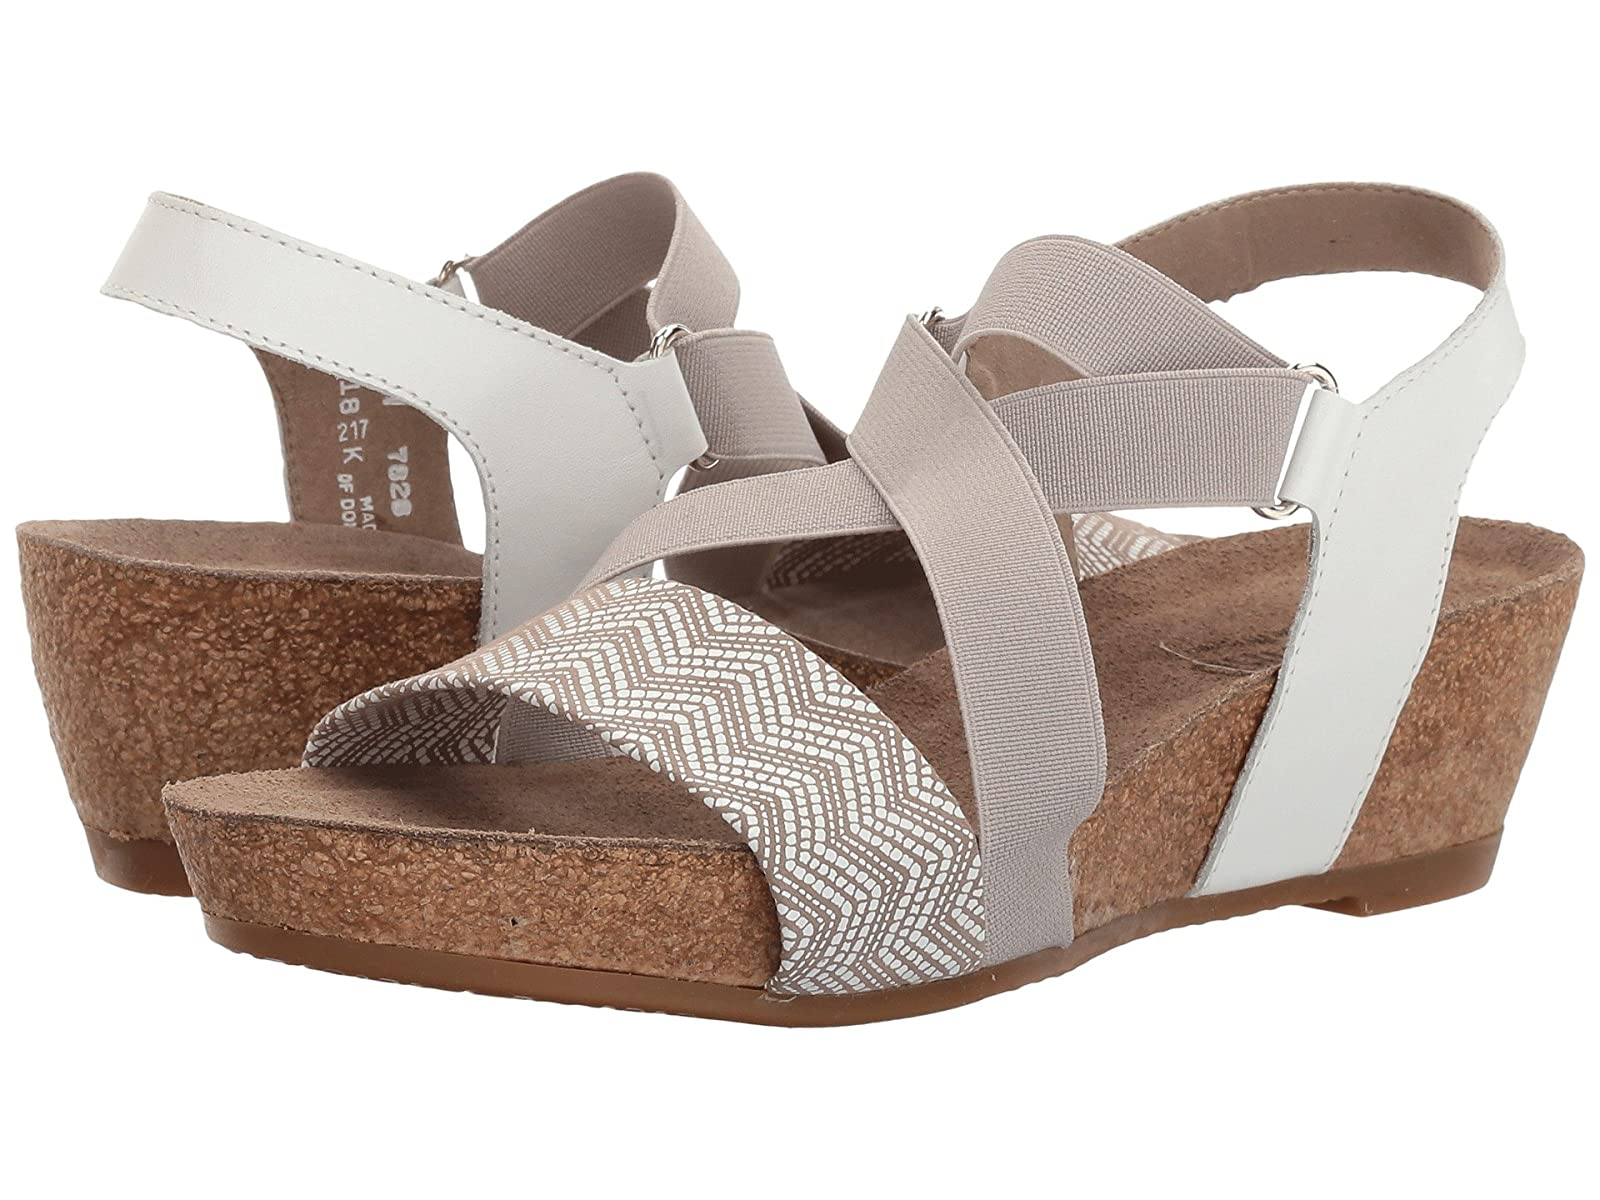 Munro LidoCheap and distinctive eye-catching shoes